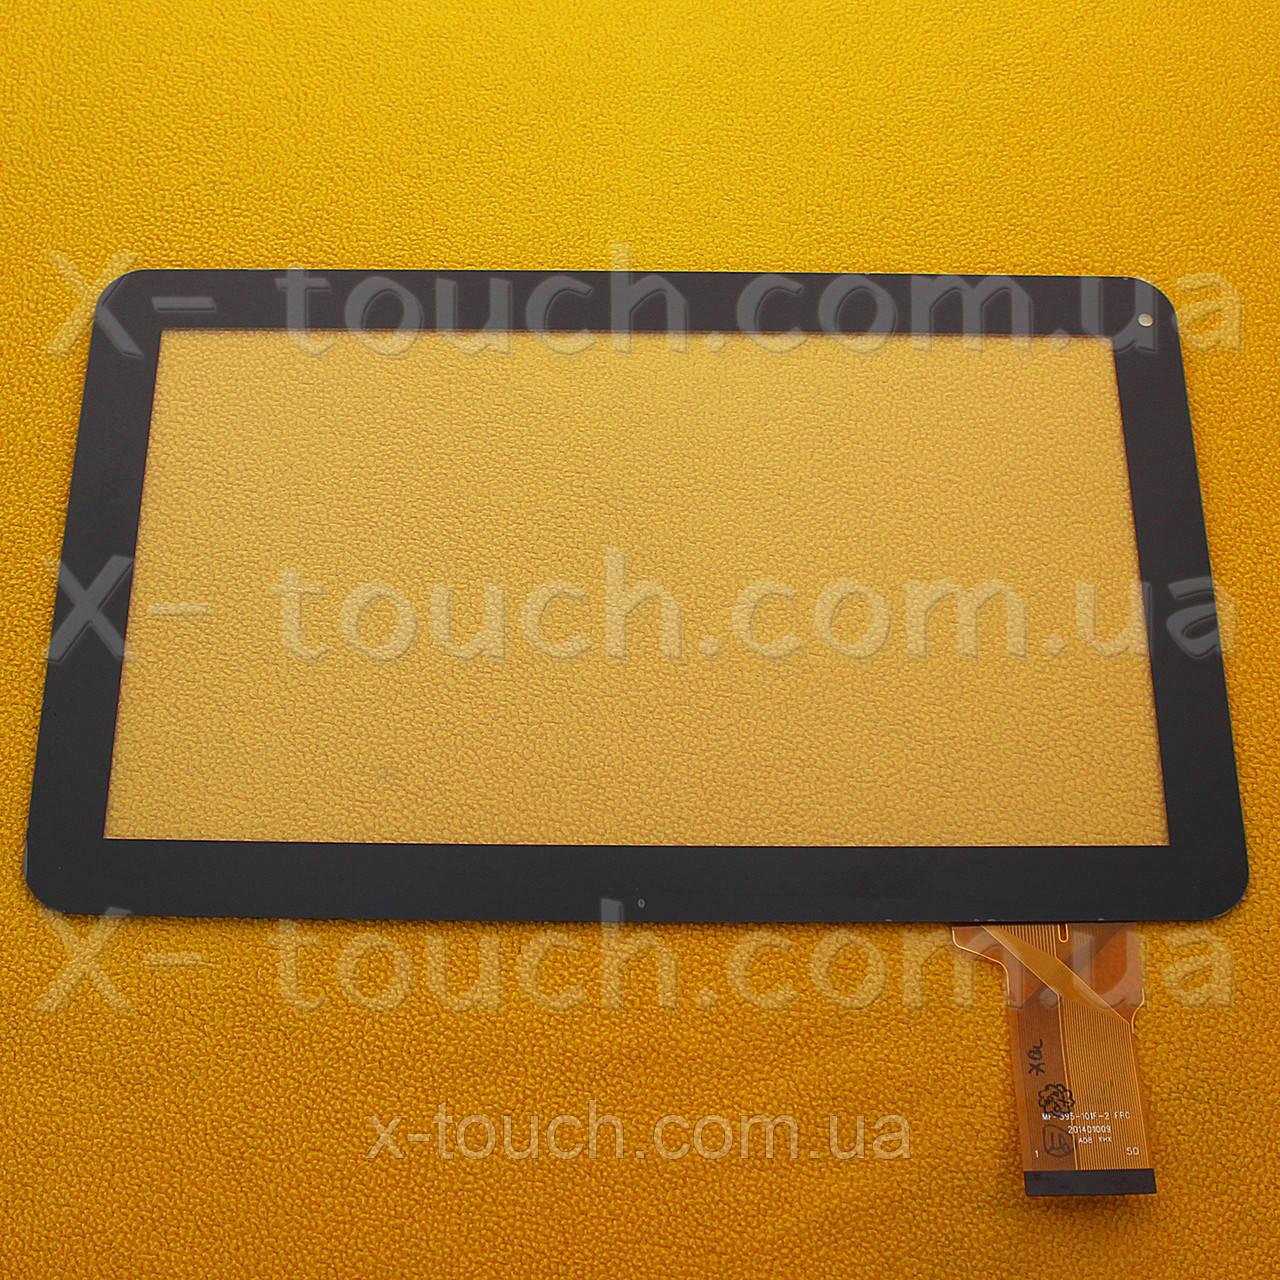 Тачскрин, сенсор Impression impad 1004 для планшета